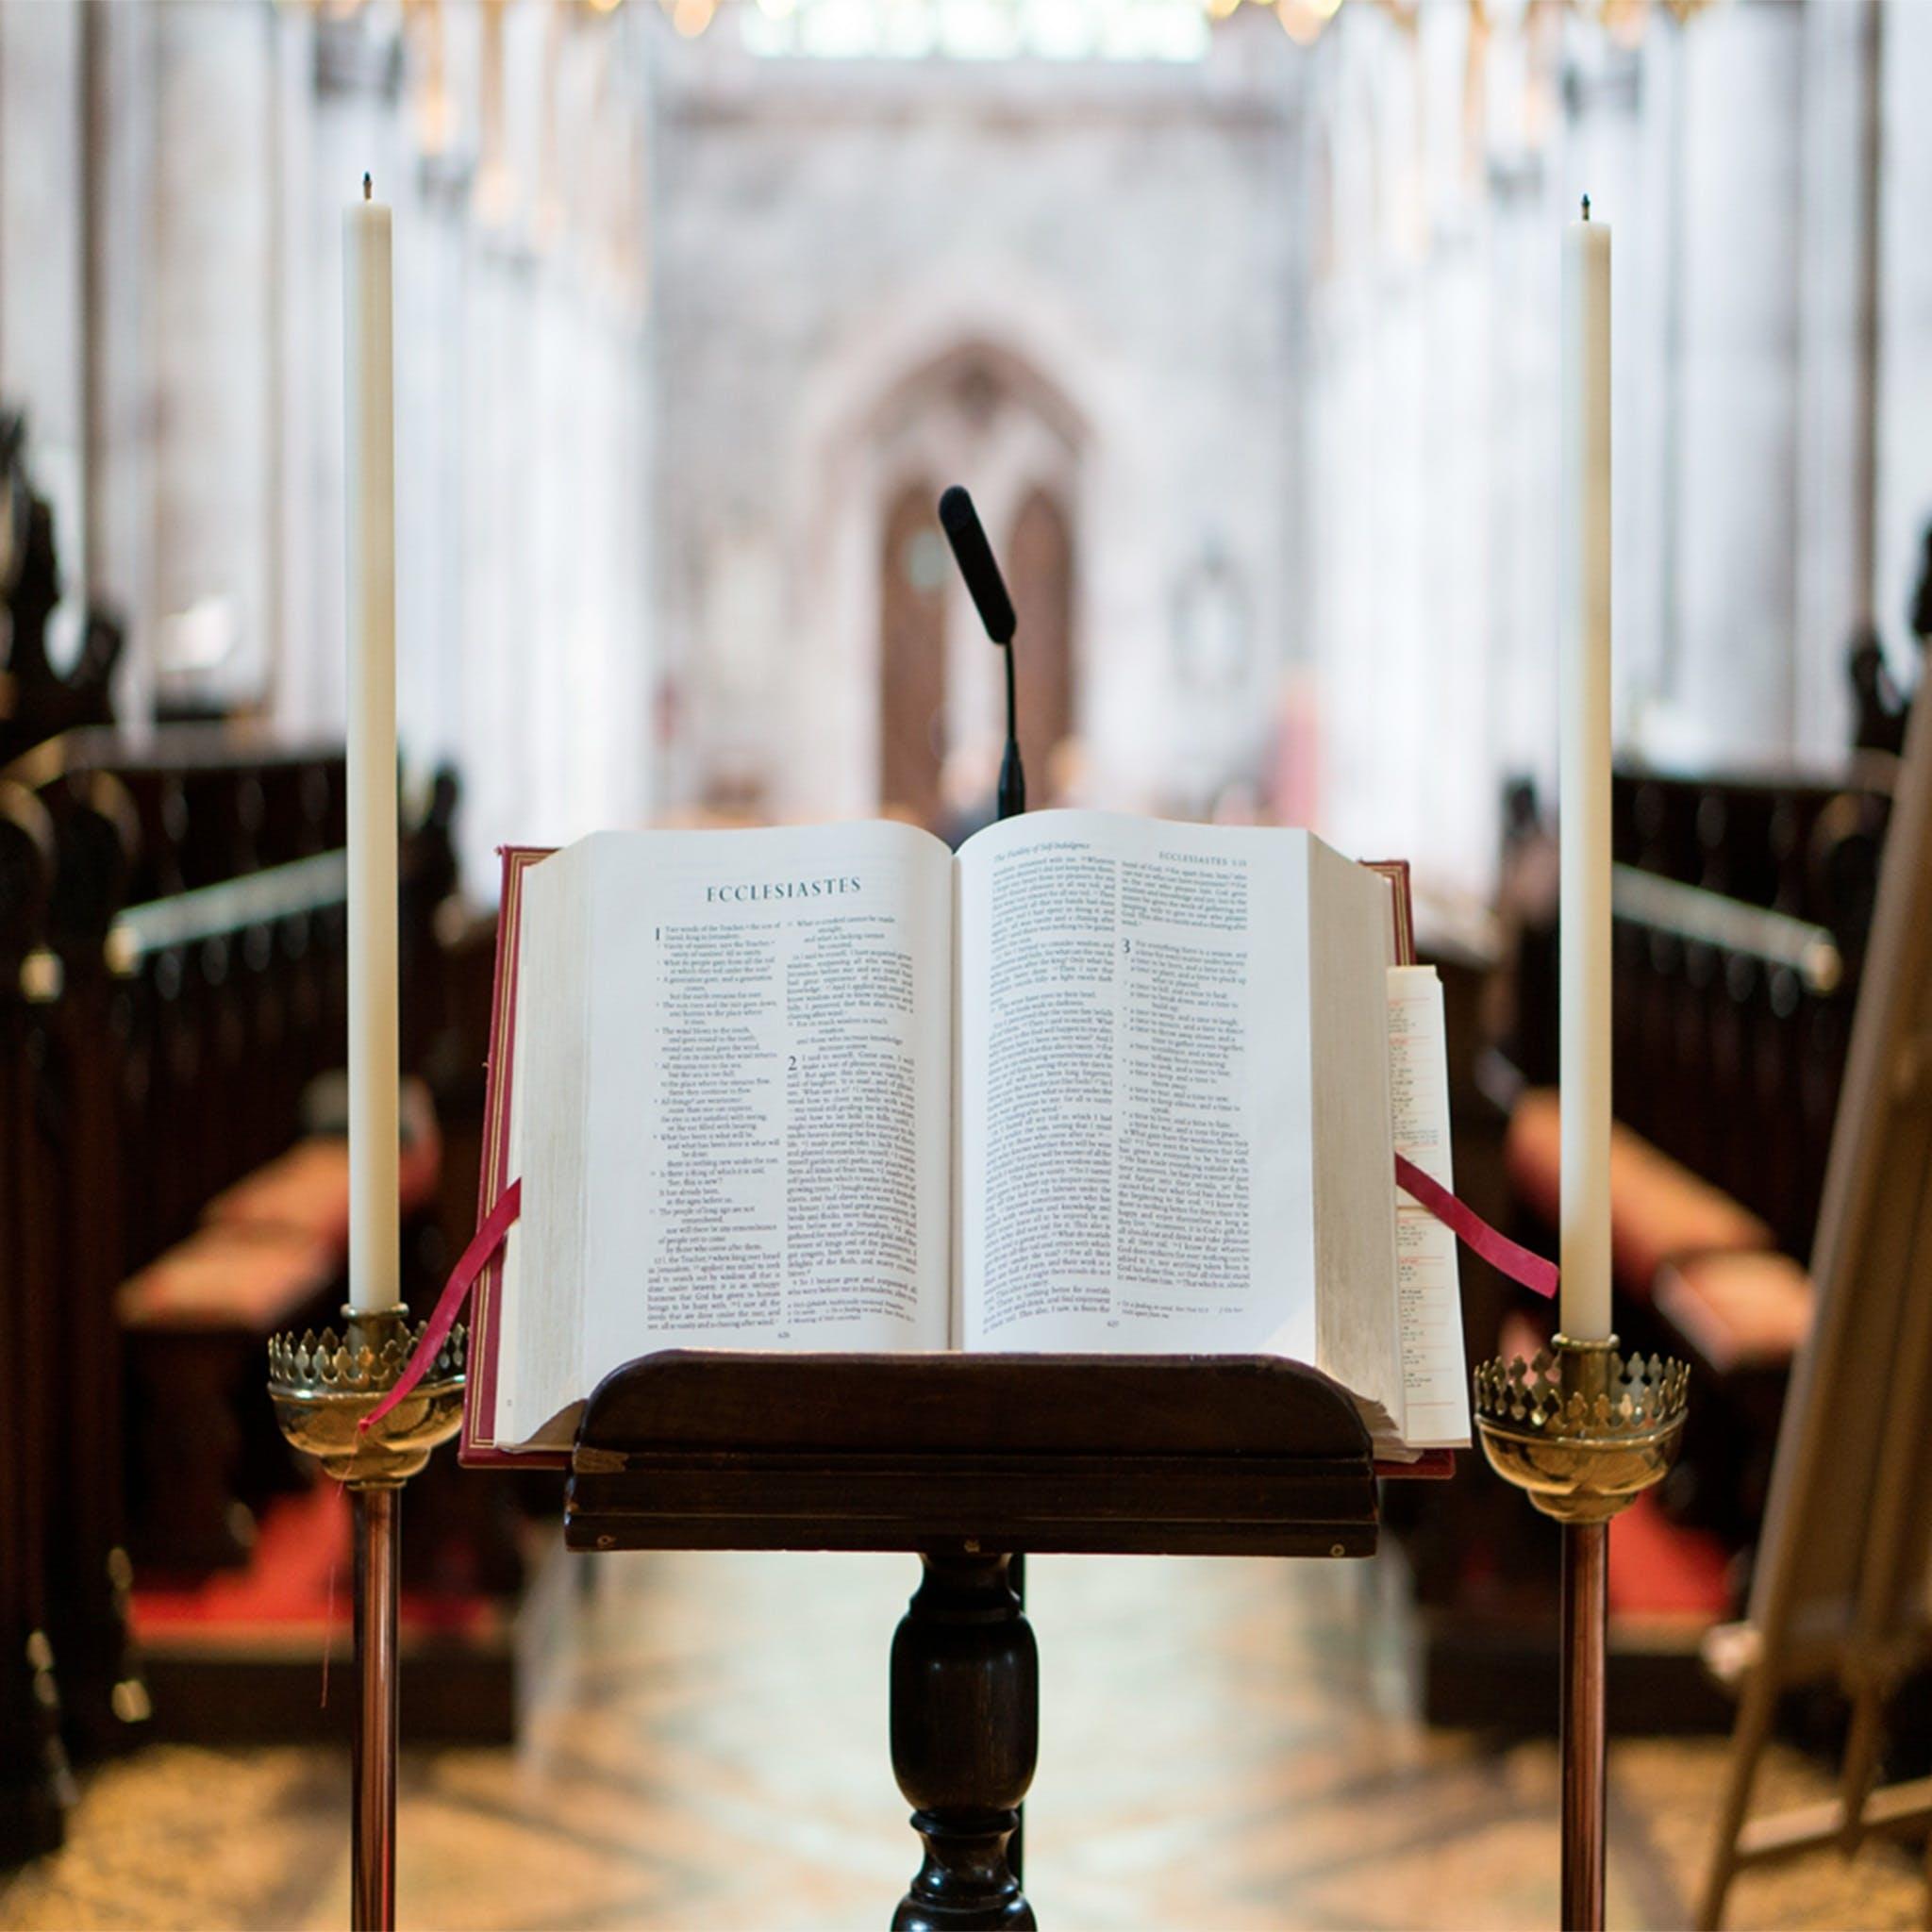 architecture, bible, blur